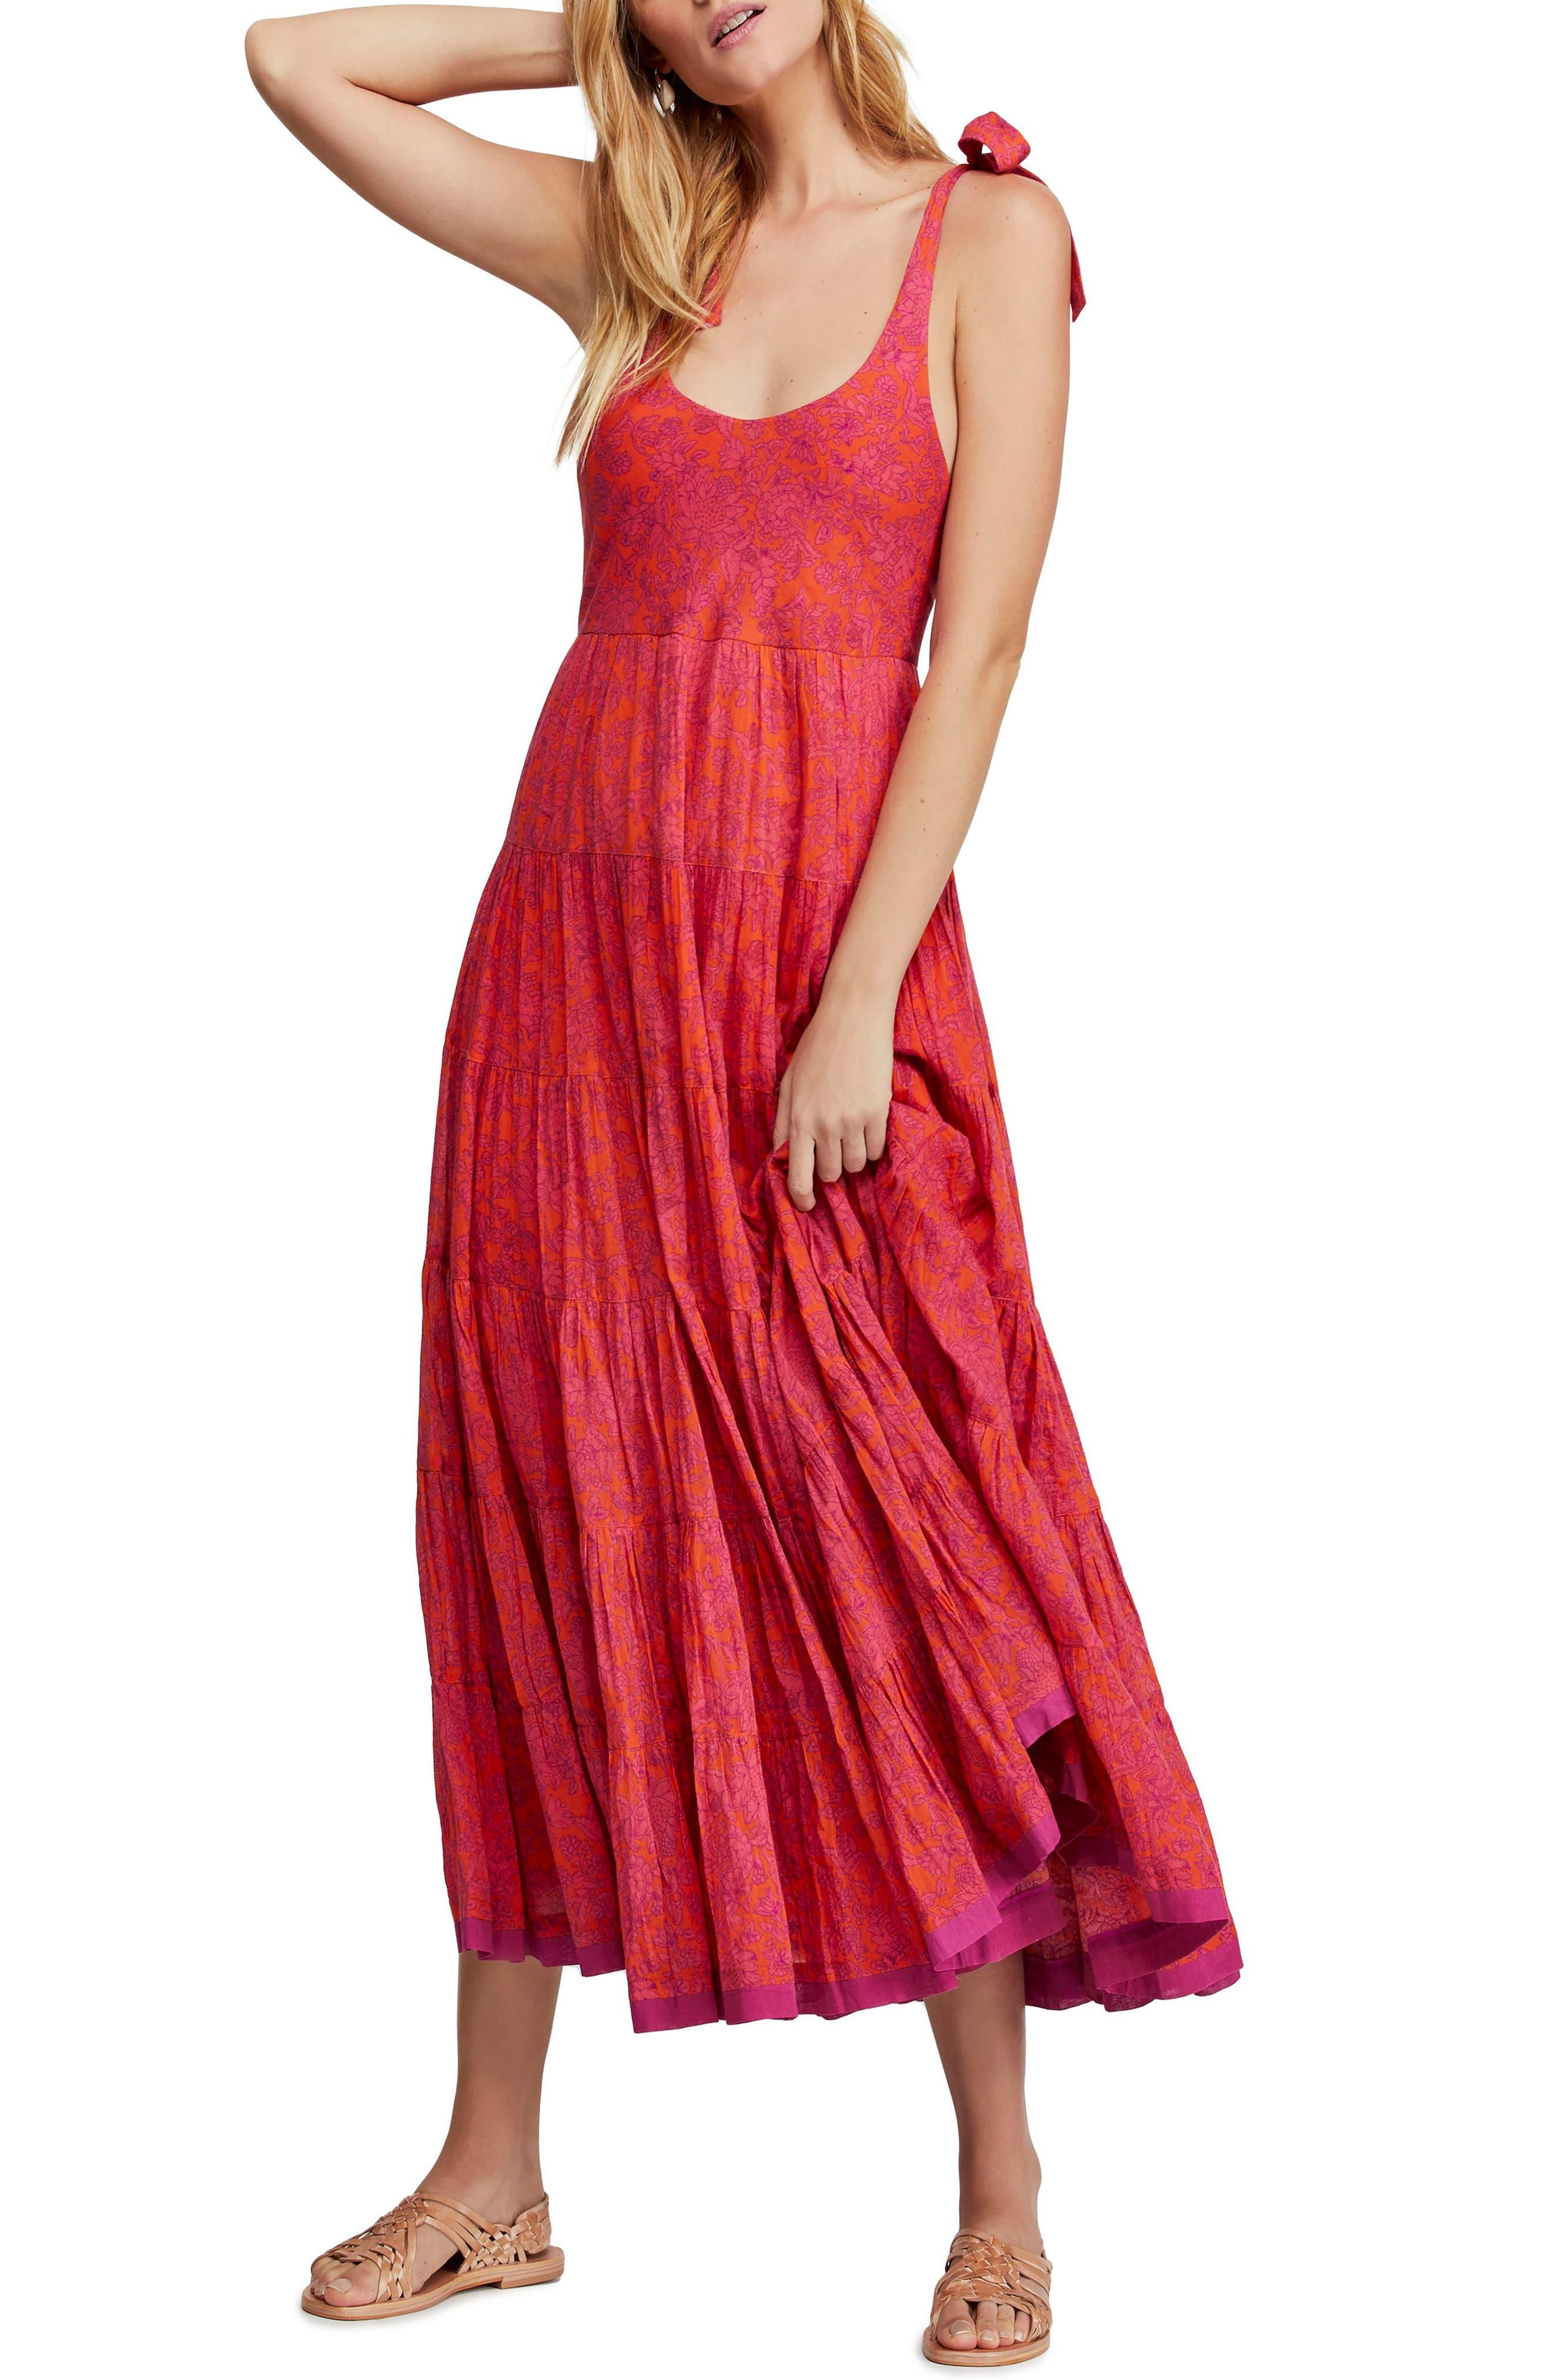 Free People Kikas Print Dress, Pink